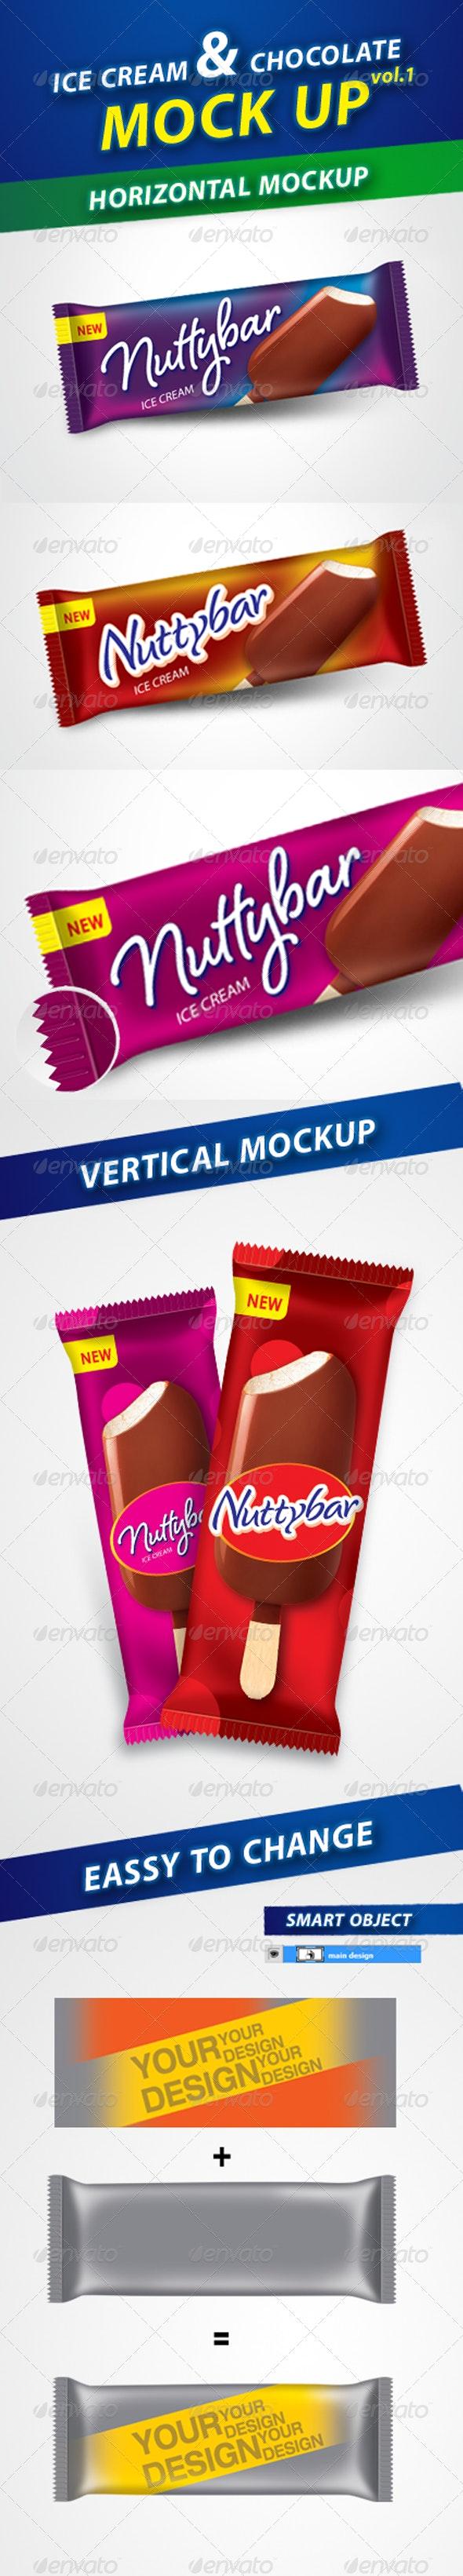 Ice Cream & Chocolate Bar Mockup - Packaging Product Mock-Ups